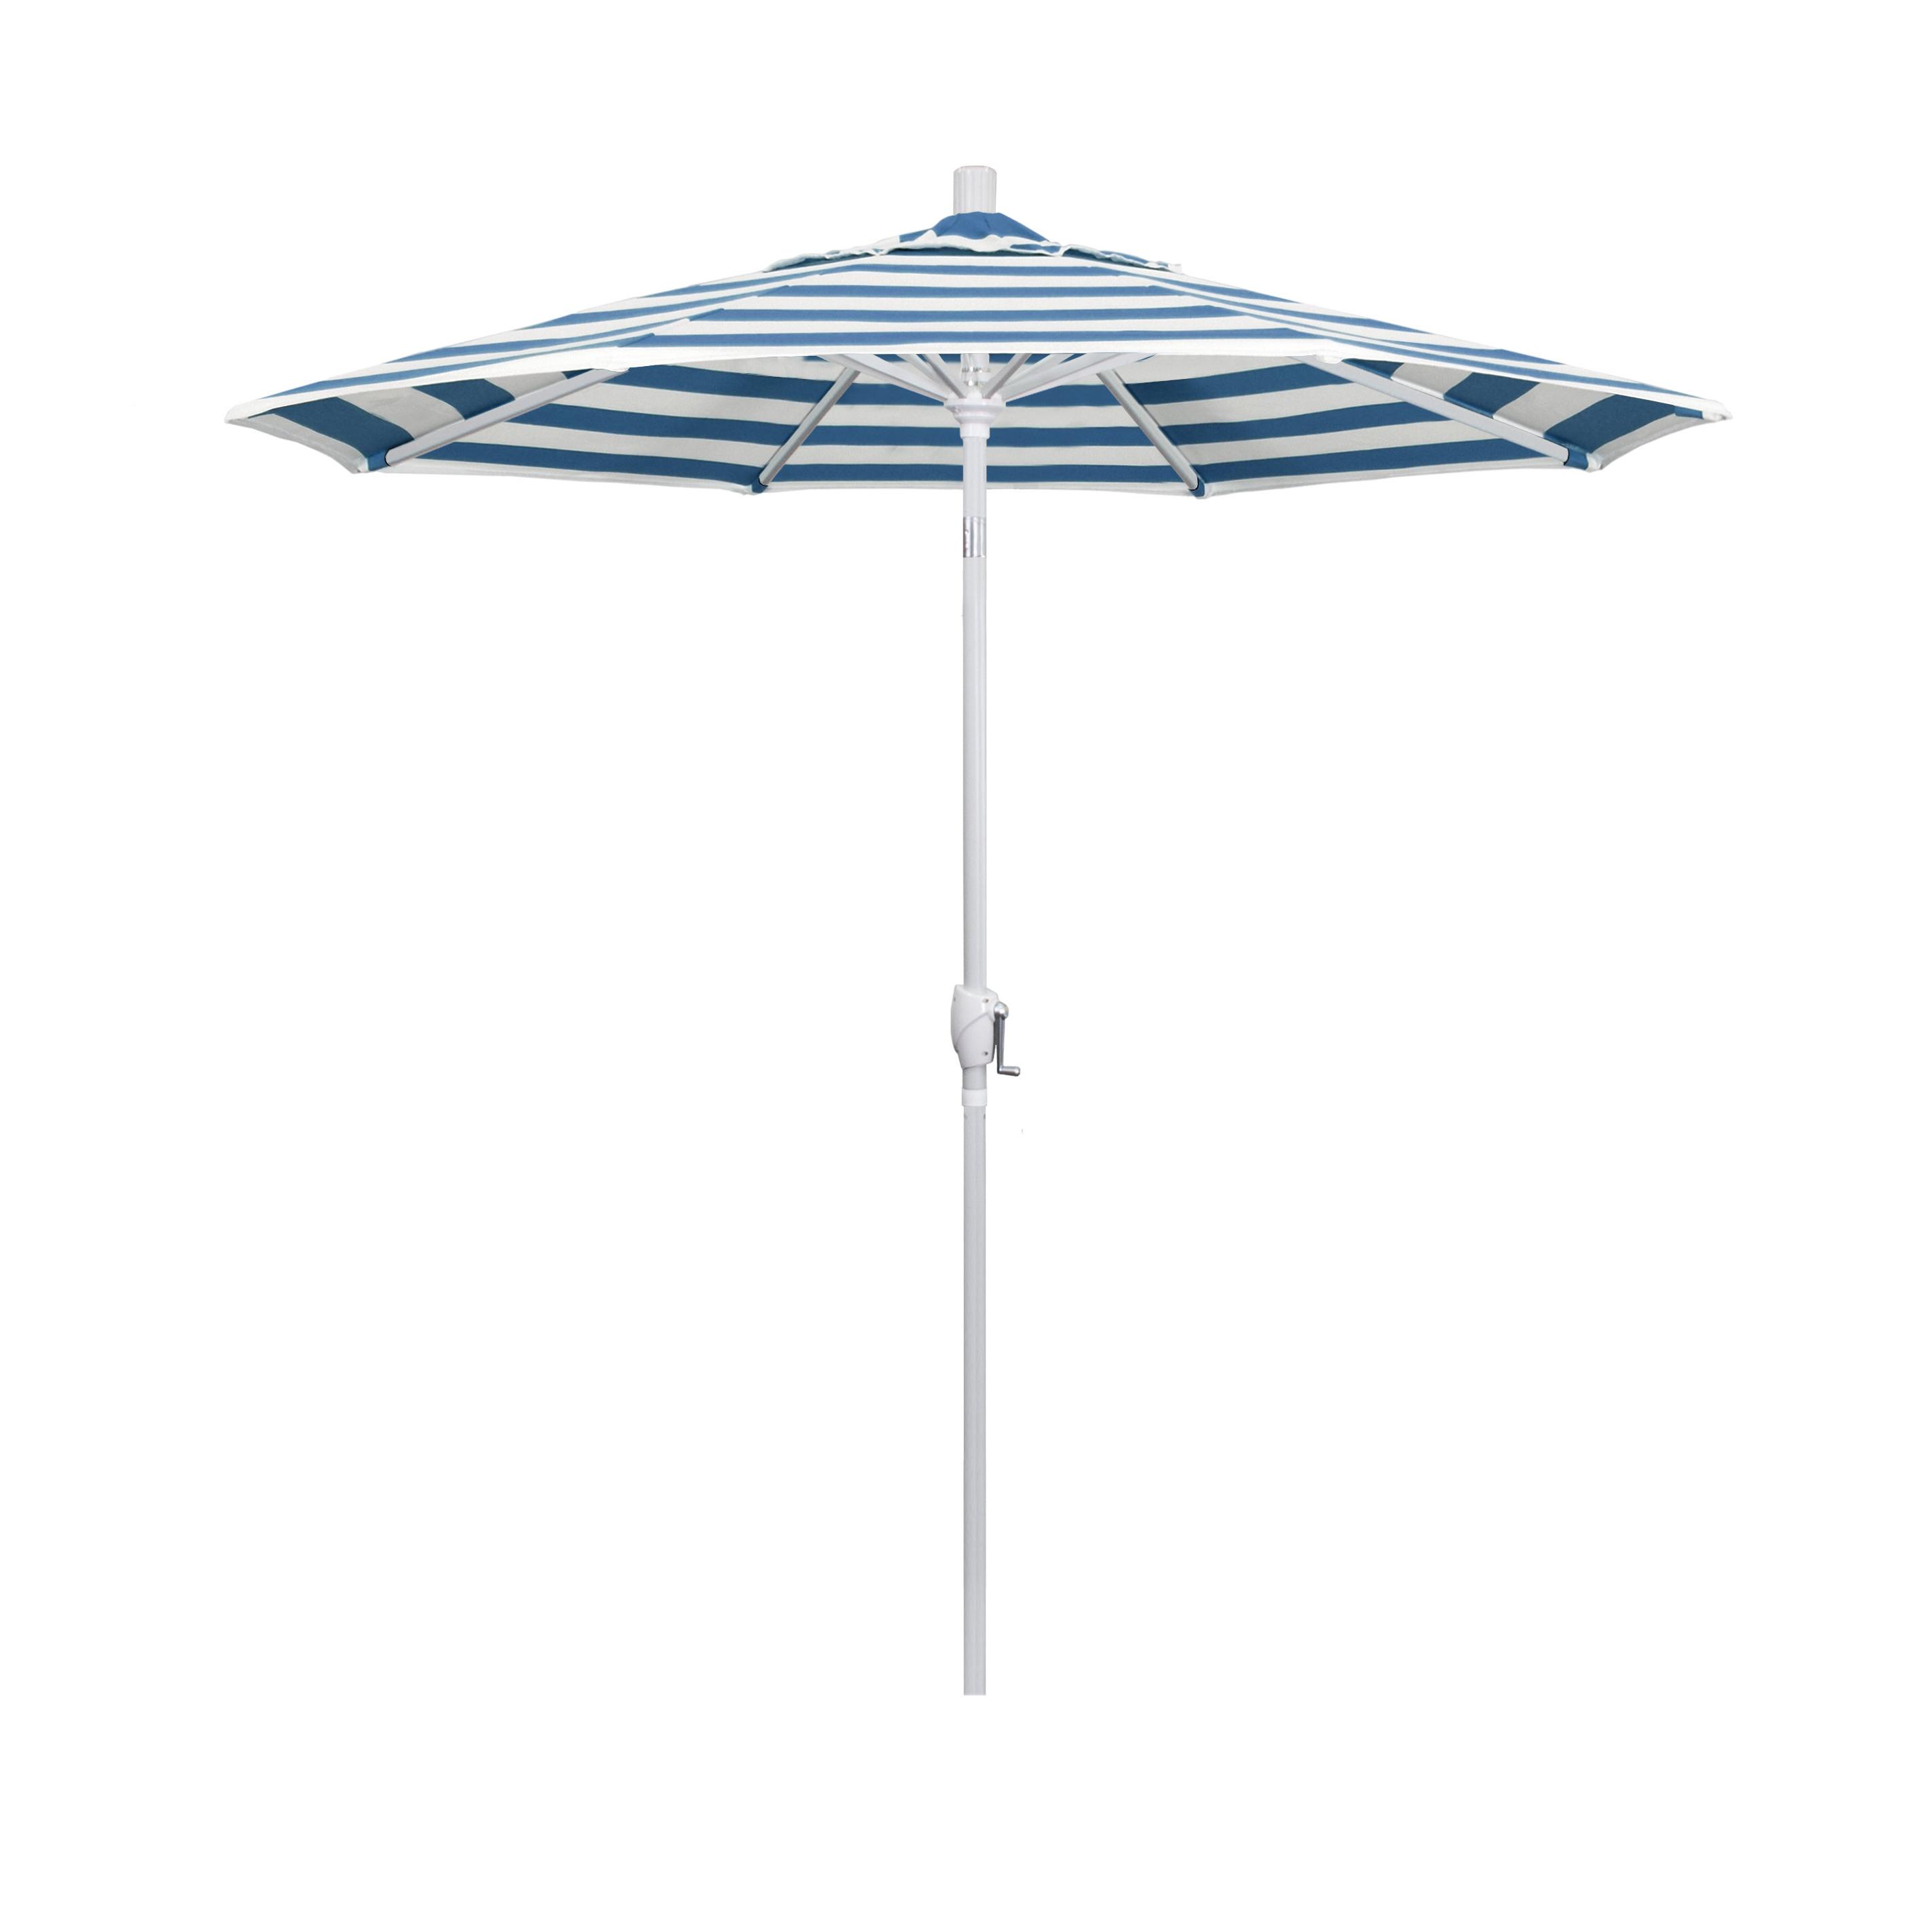 Most Recent Caravelle Market Sunbrella Umbrellas With Regard To  (View 15 of 20)